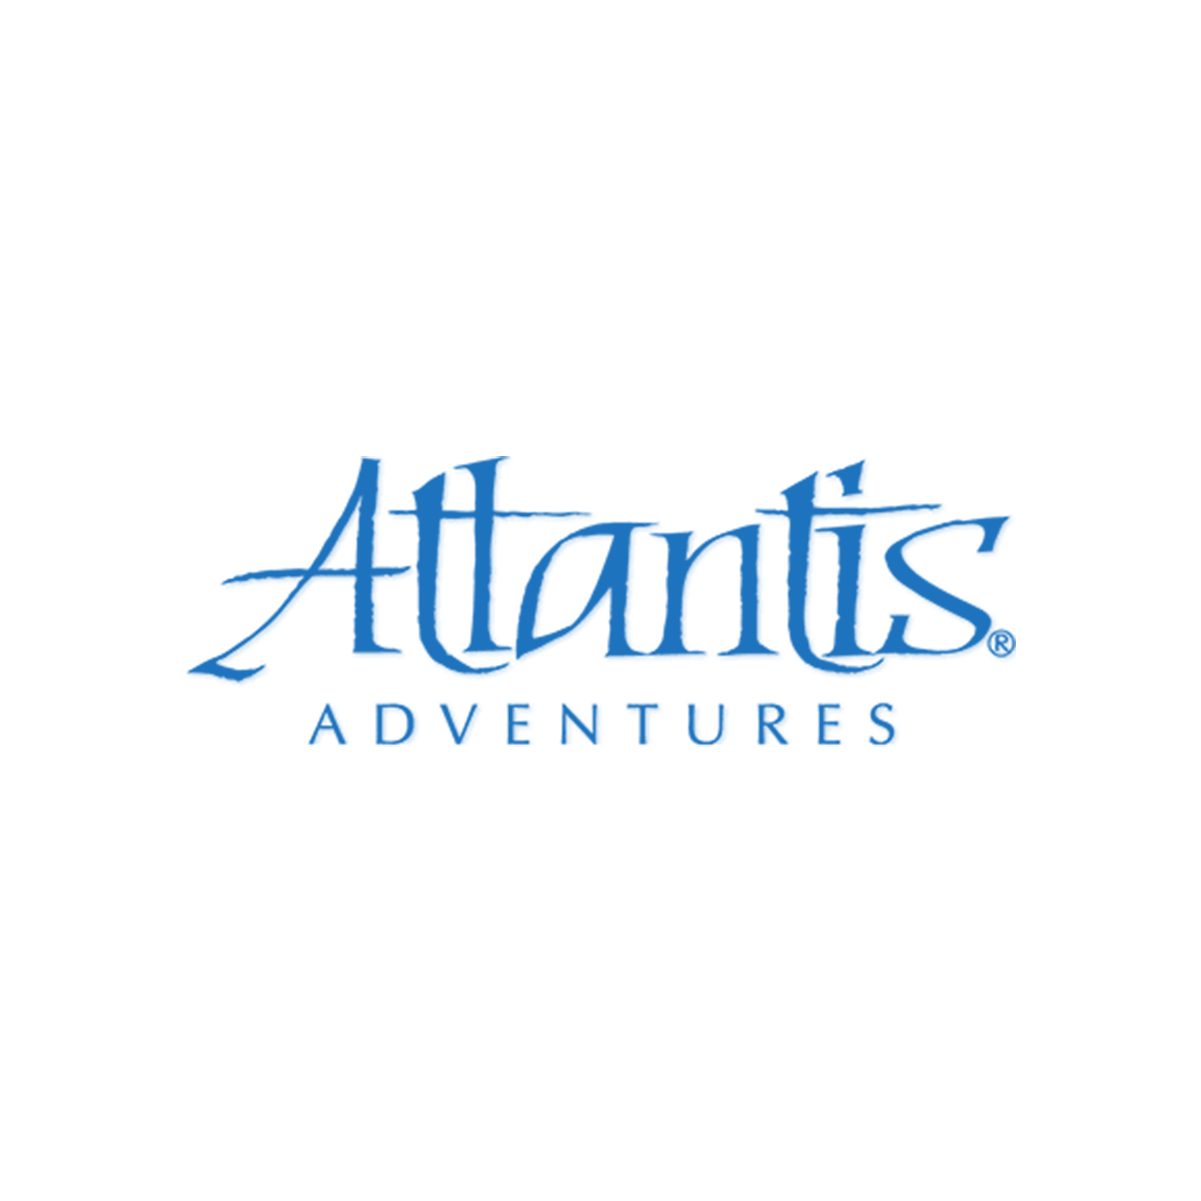 https://www.everydayvoip.com/wp-content/webpc-passthru.php?src=https://www.everydayvoip.com/wp-content/uploads/sites/3/2020/05/atlantis_logo.jpg&nocache=1